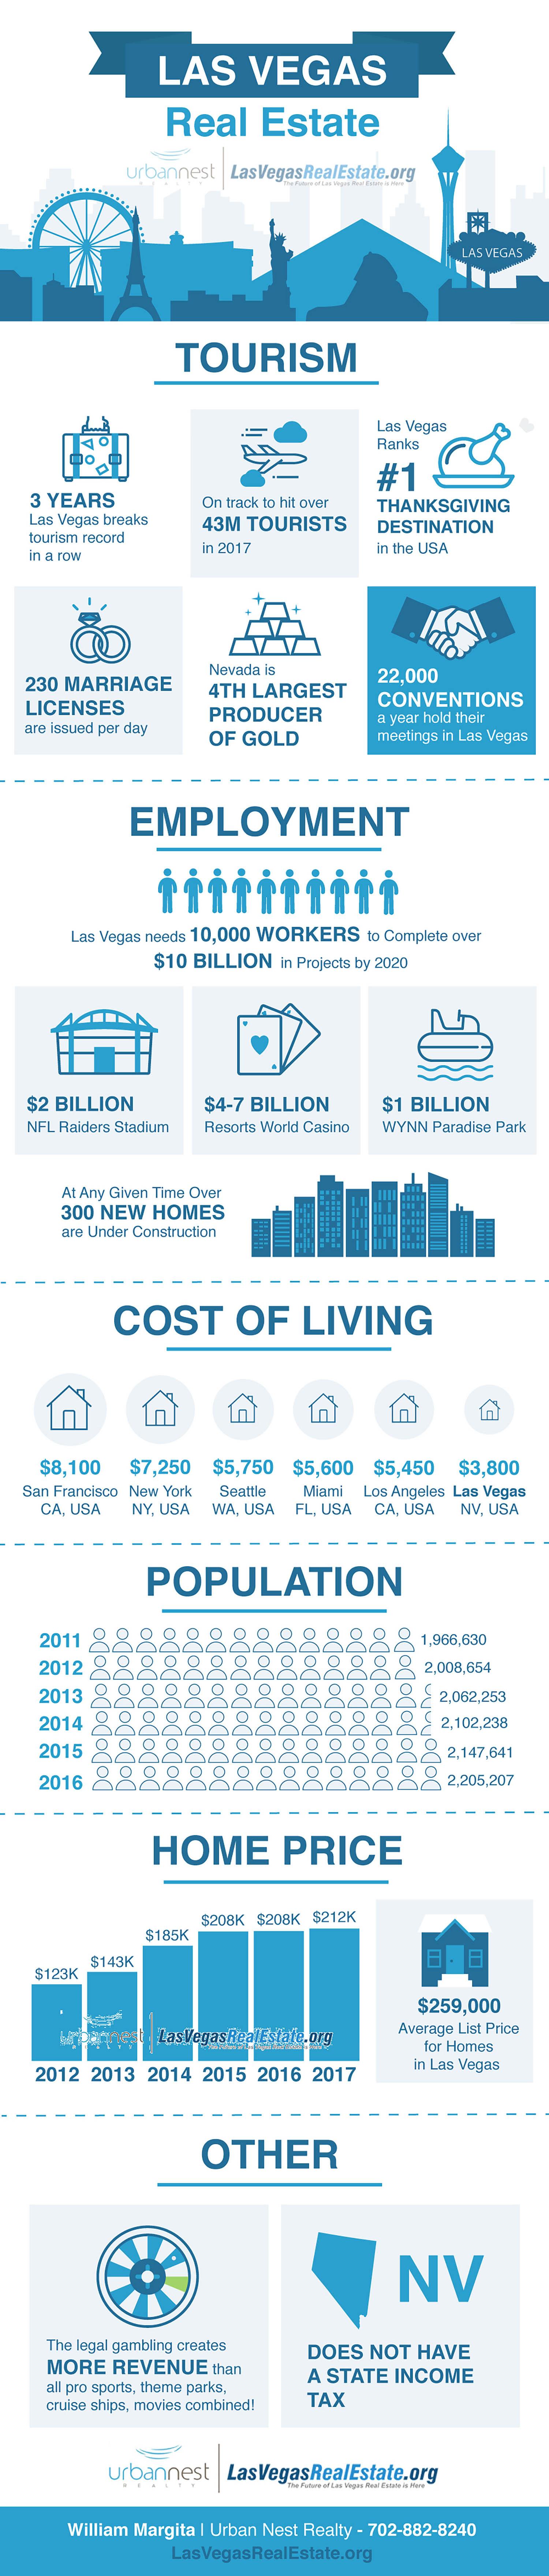 The Las Vegas Real Estate Market